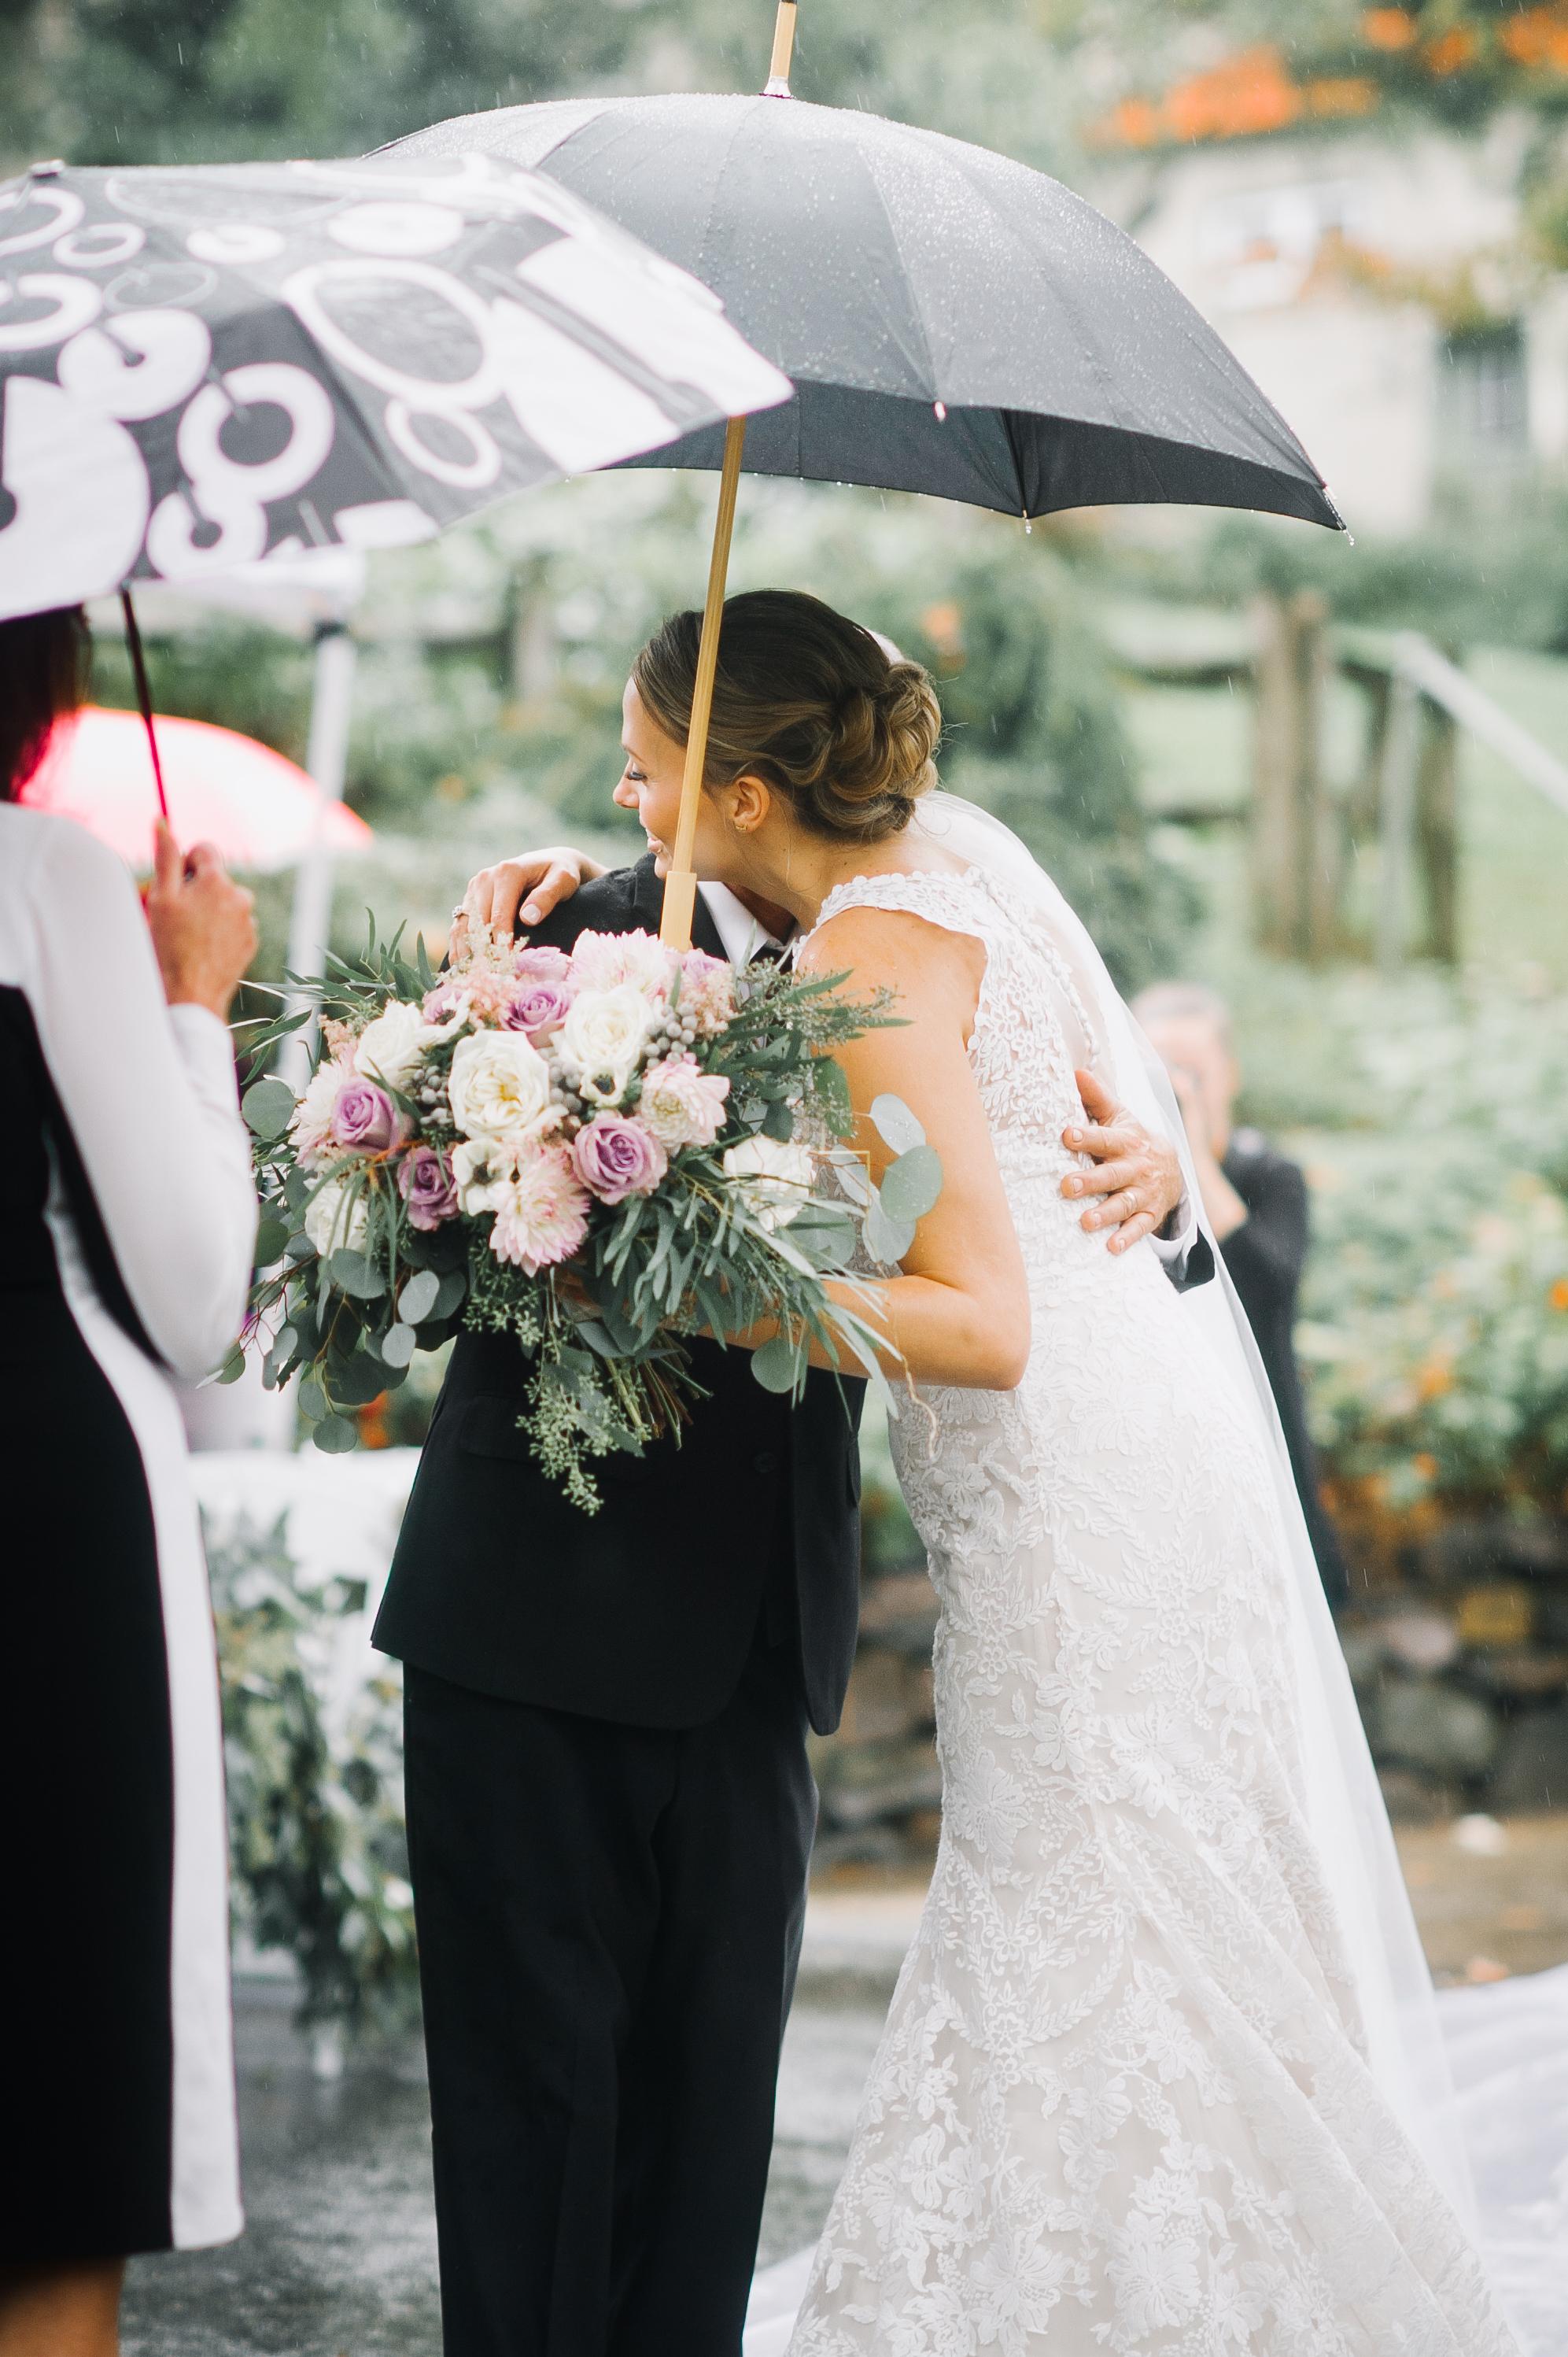 Stephanie & Tim | The Sage Farmhouse Wedding